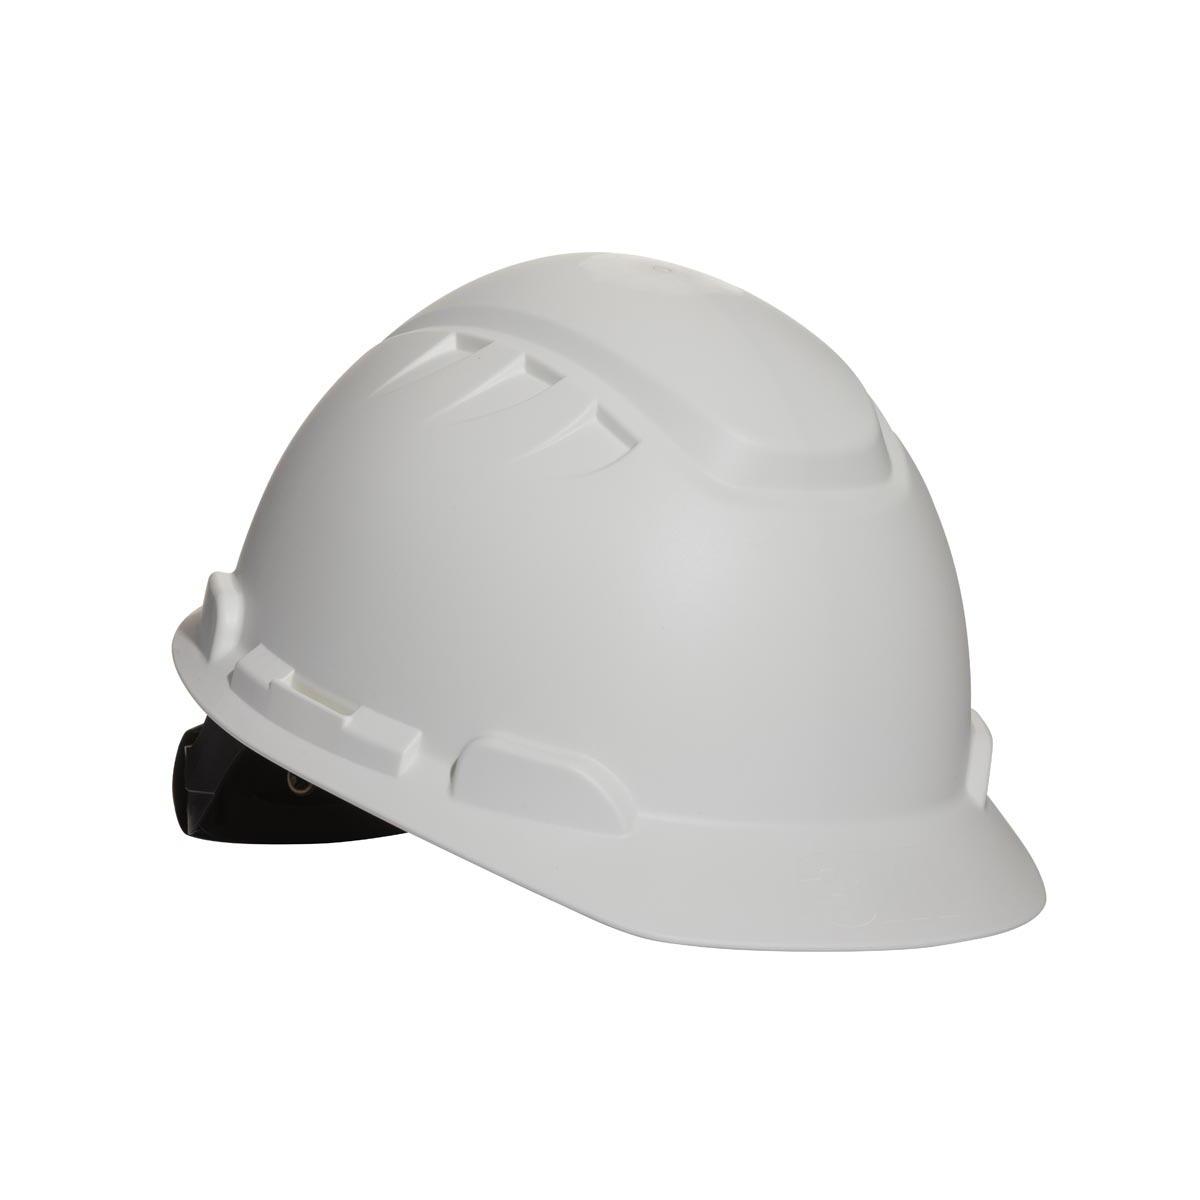 3M Elevated Temperature Hard Hat  White 4-Point Ratchet Suspension H-701T